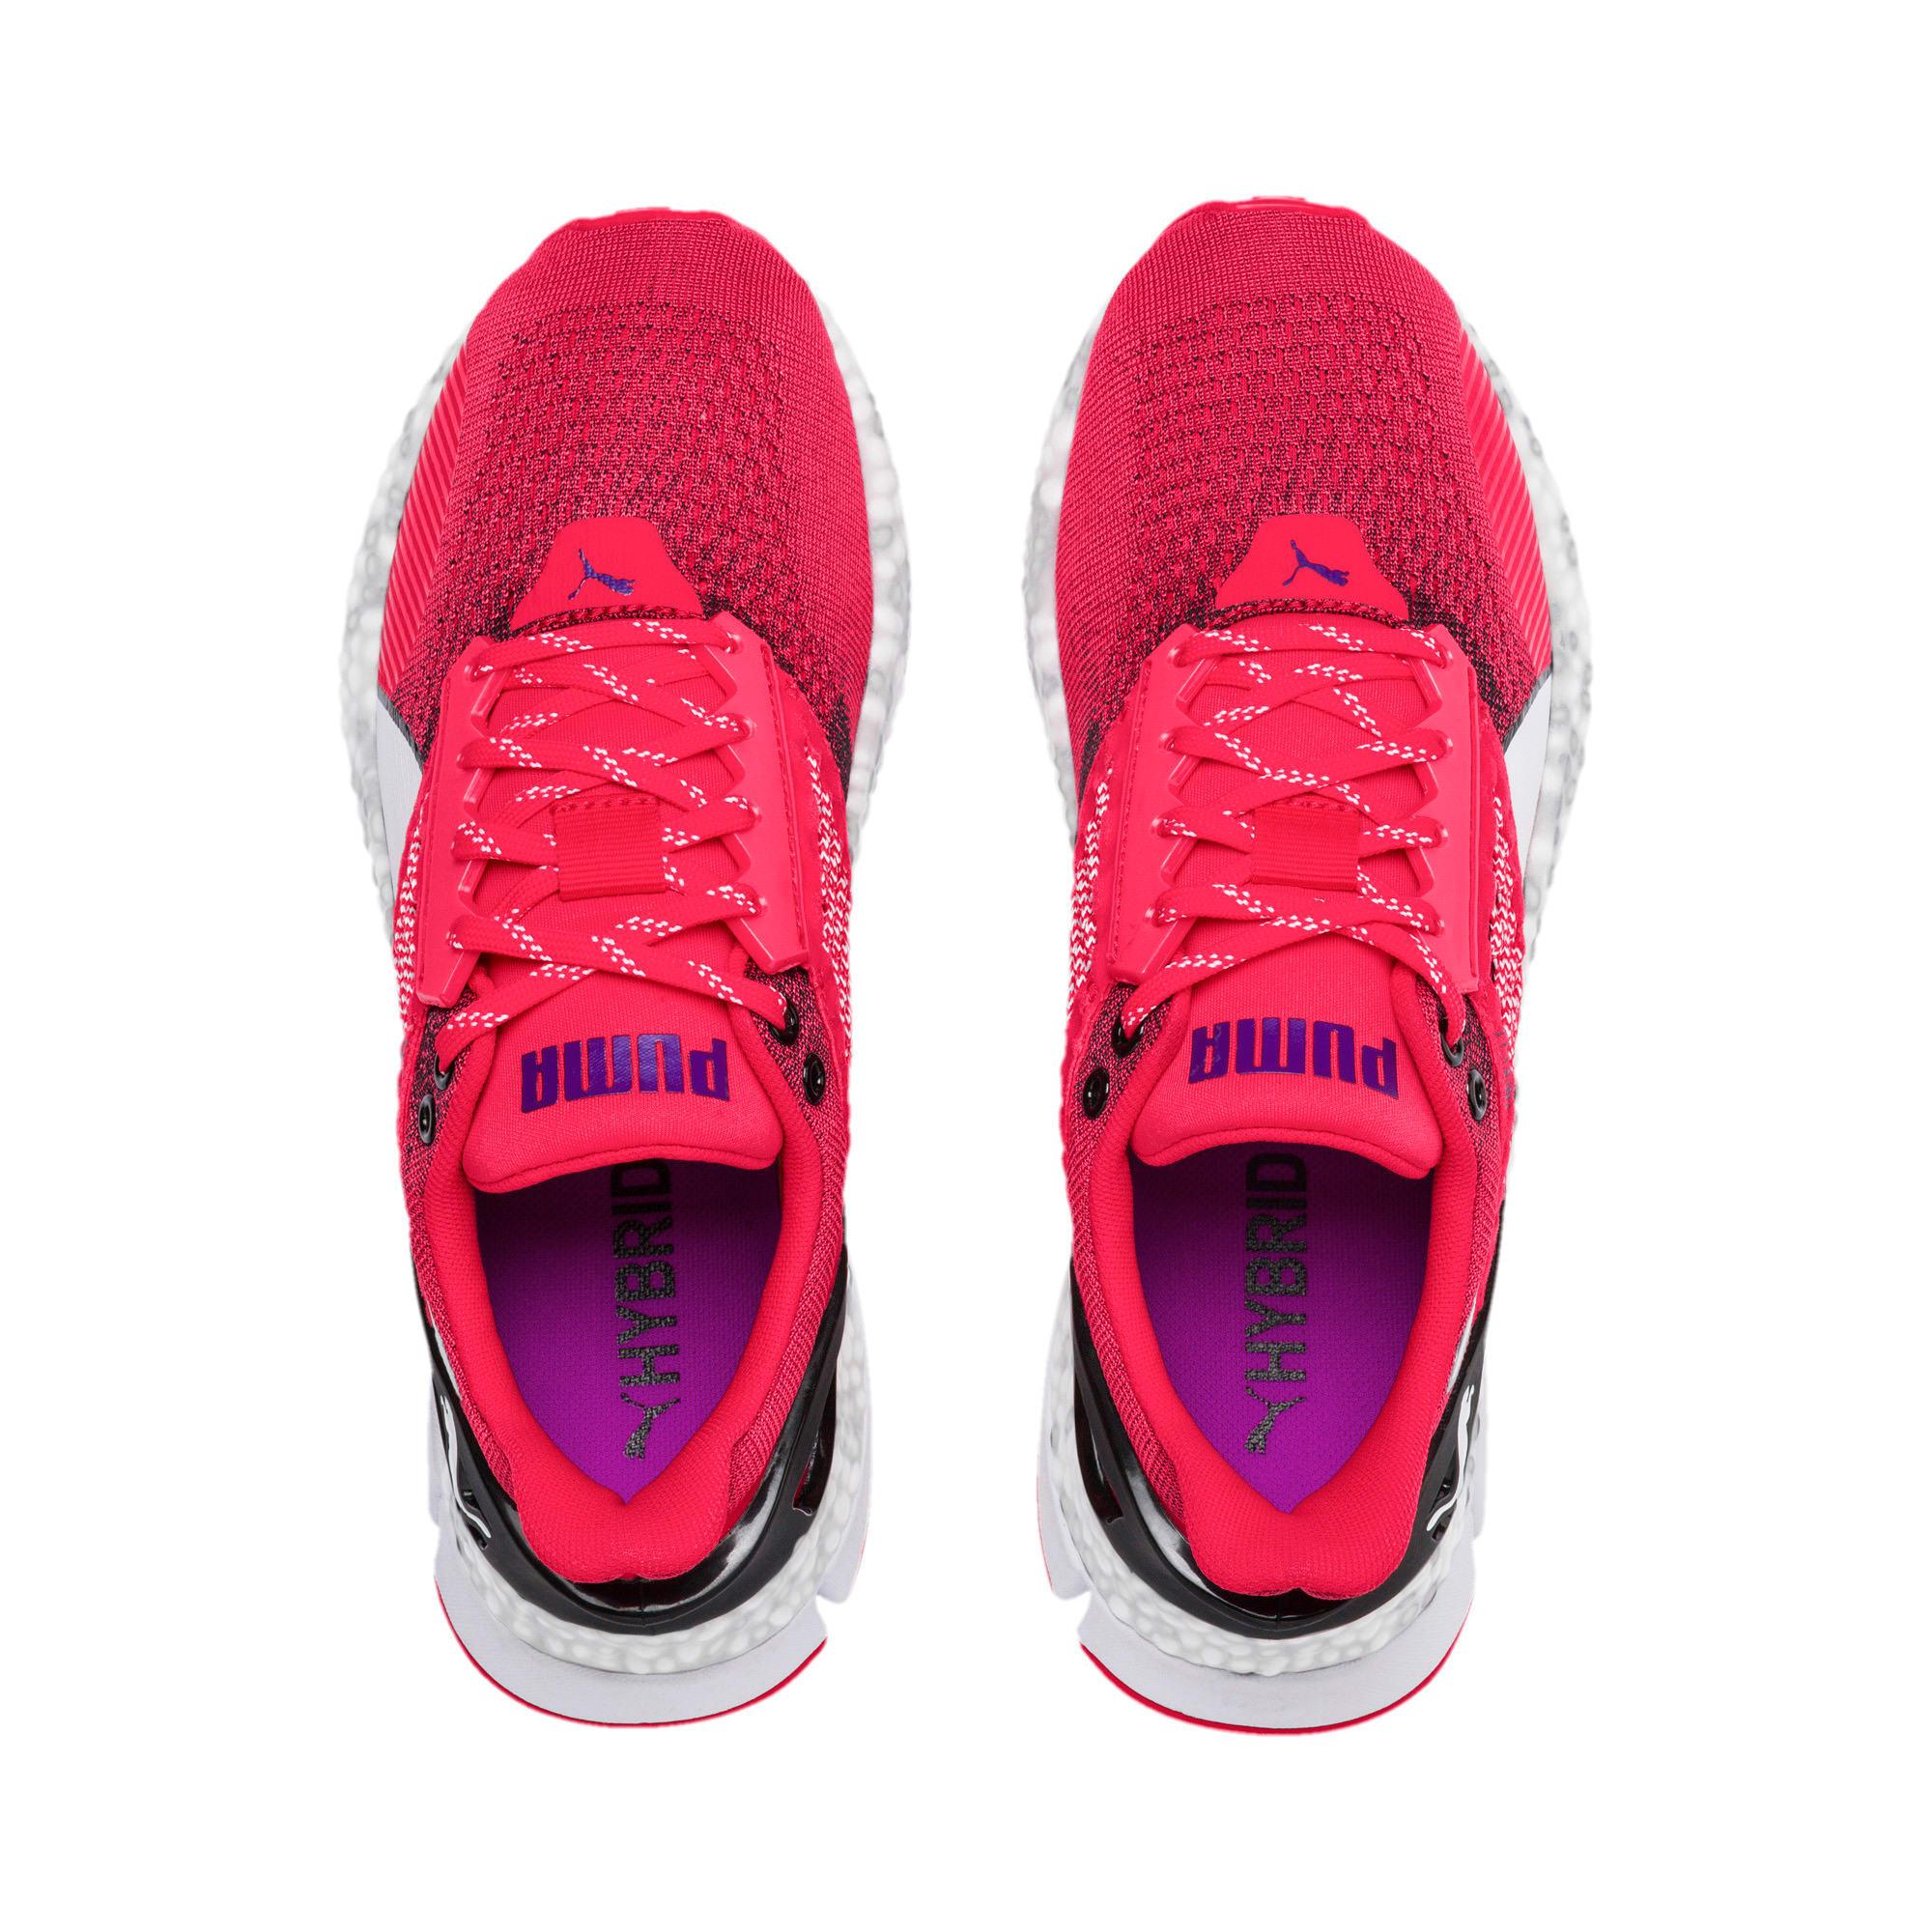 Thumbnail 9 of HYBRID Astro Women's Running Shoes, Nrgy Rose-Puma Black, medium